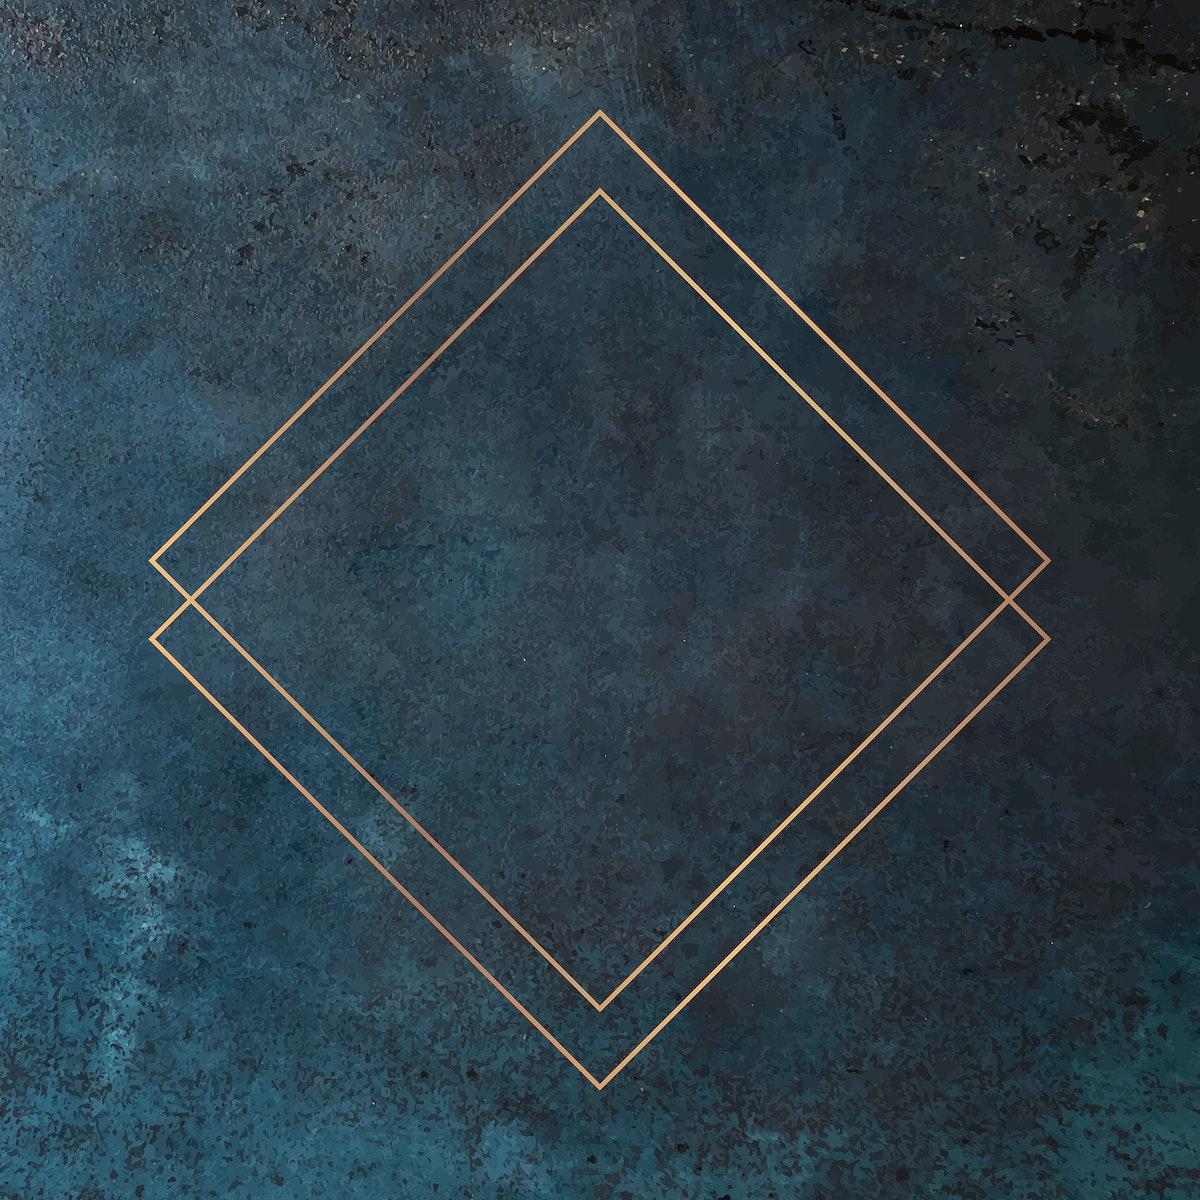 Rhombus gold frame on grunge background vector